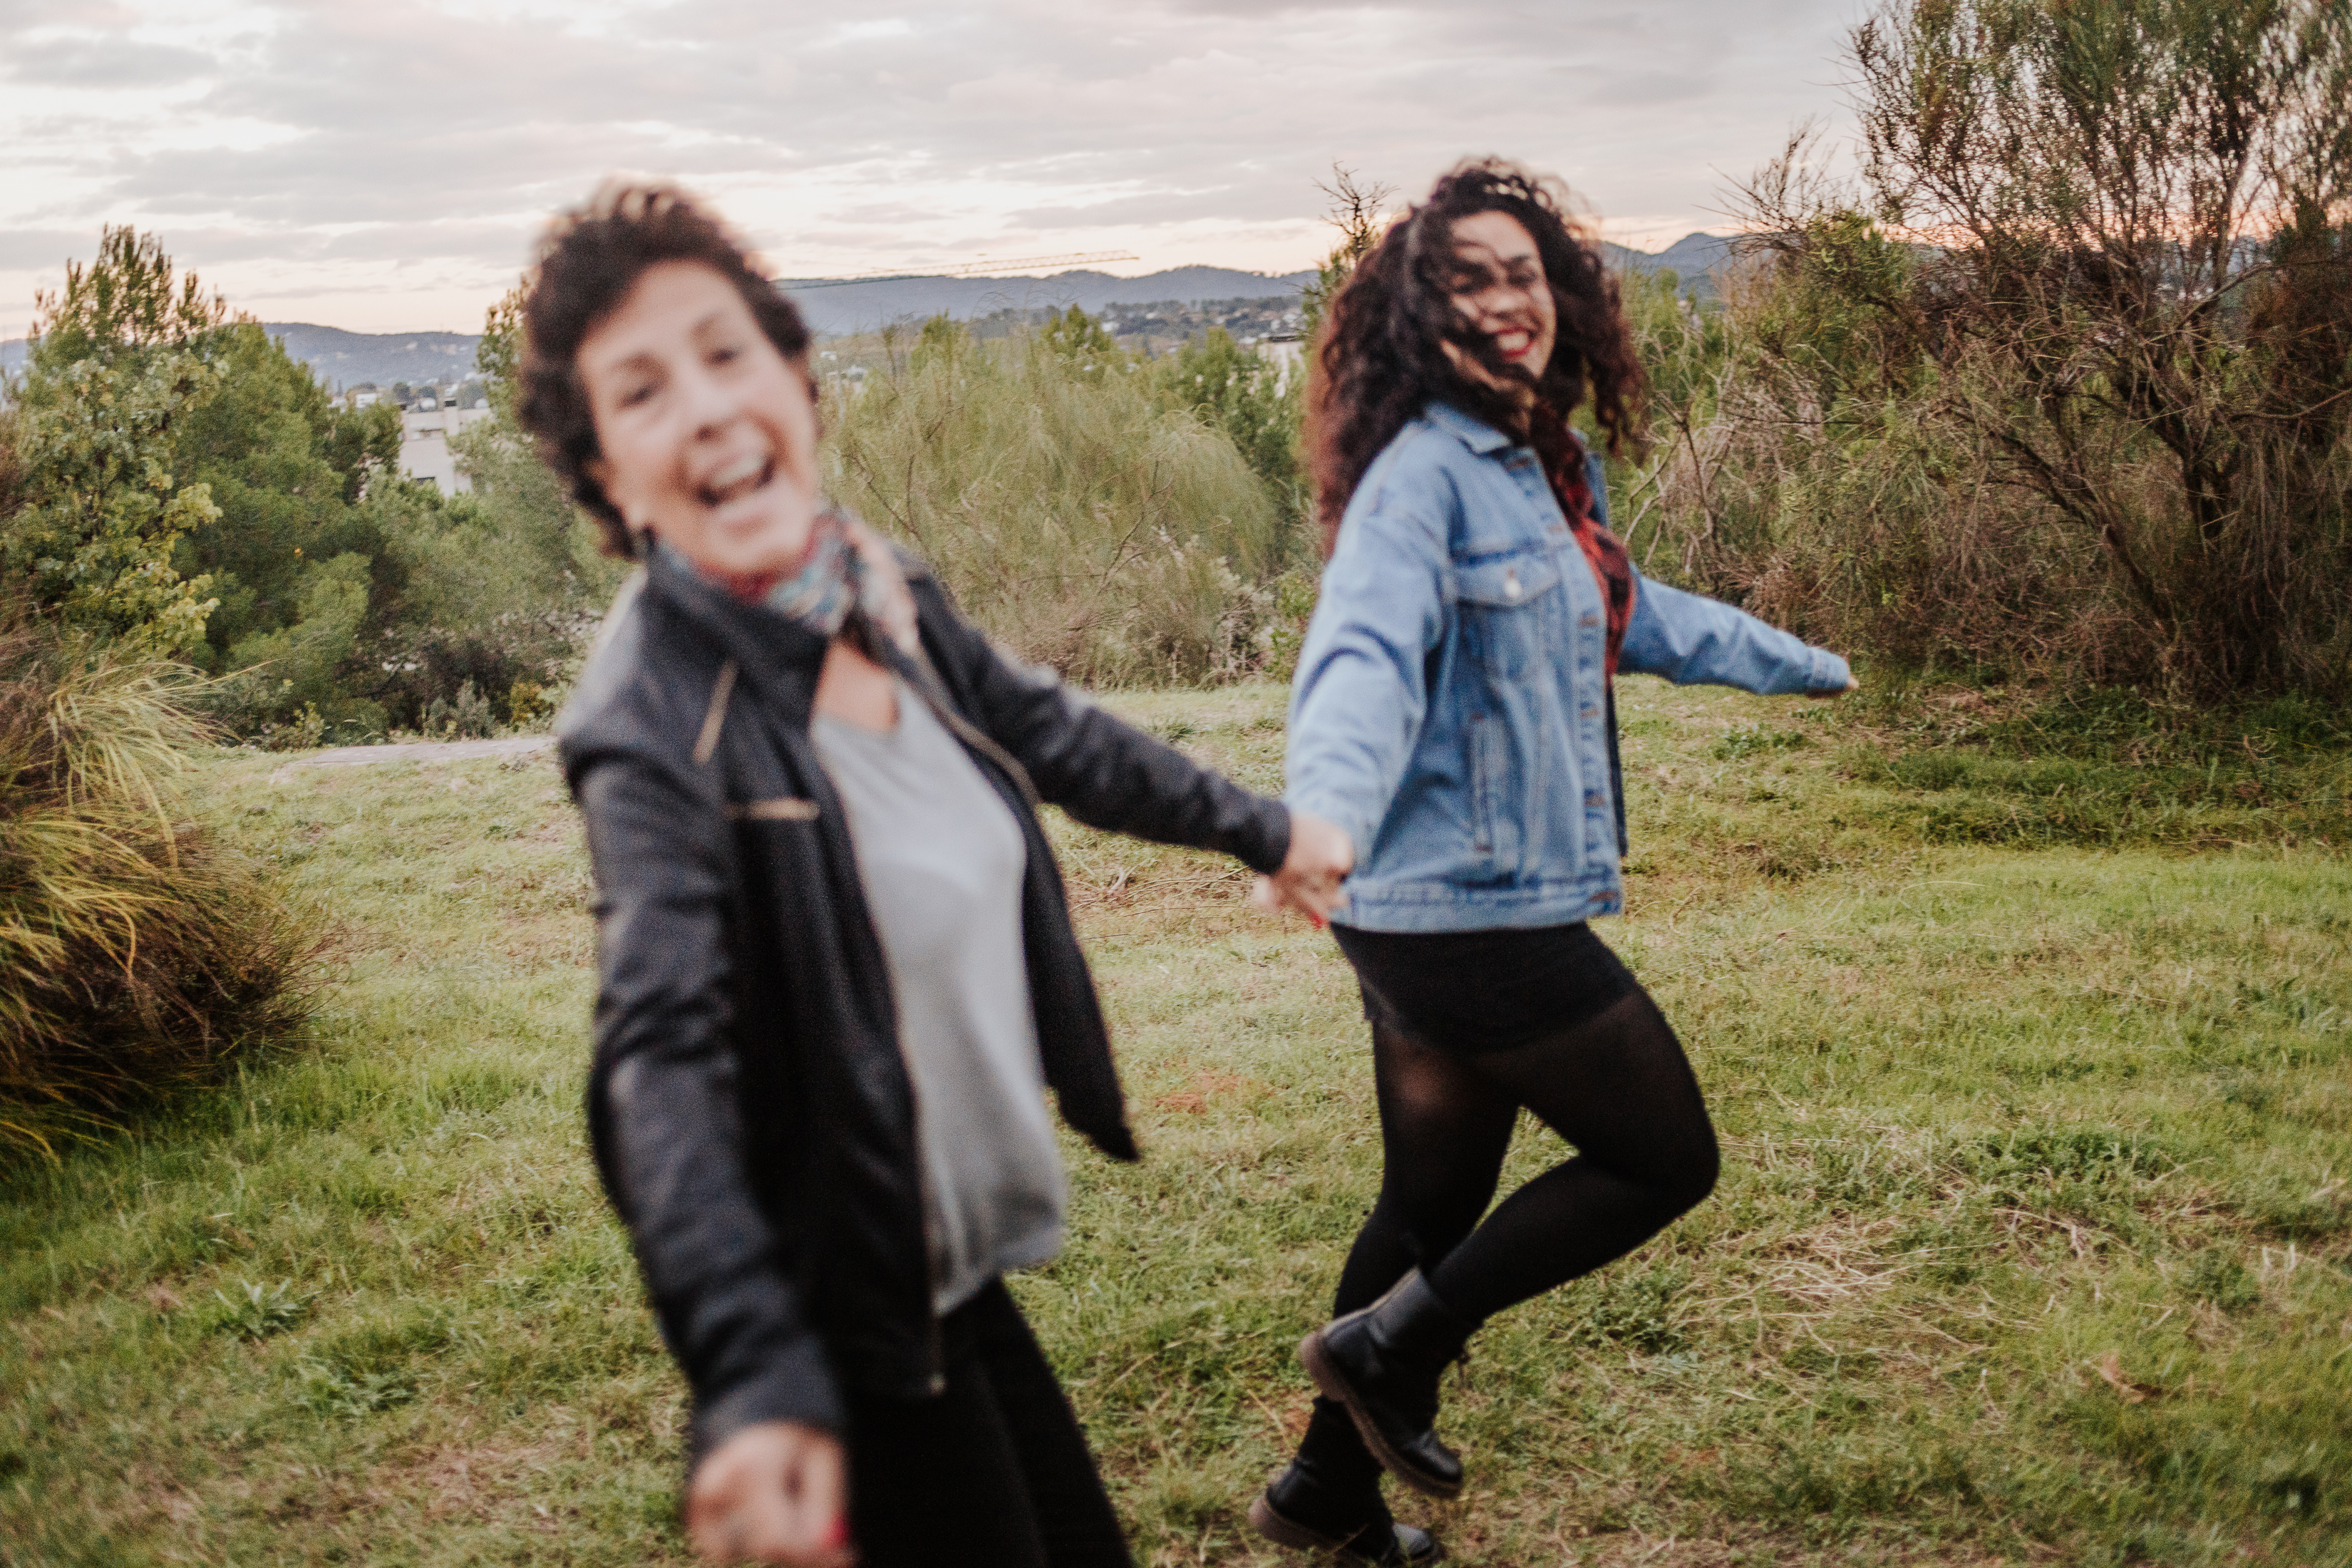 Fotógrafo familiar Sant Cugat :: Fotógrafo de familia :: Mercantic :: Fotografía madre y hija :: Fotografía natural :: Fotógrafo Sant Cugat